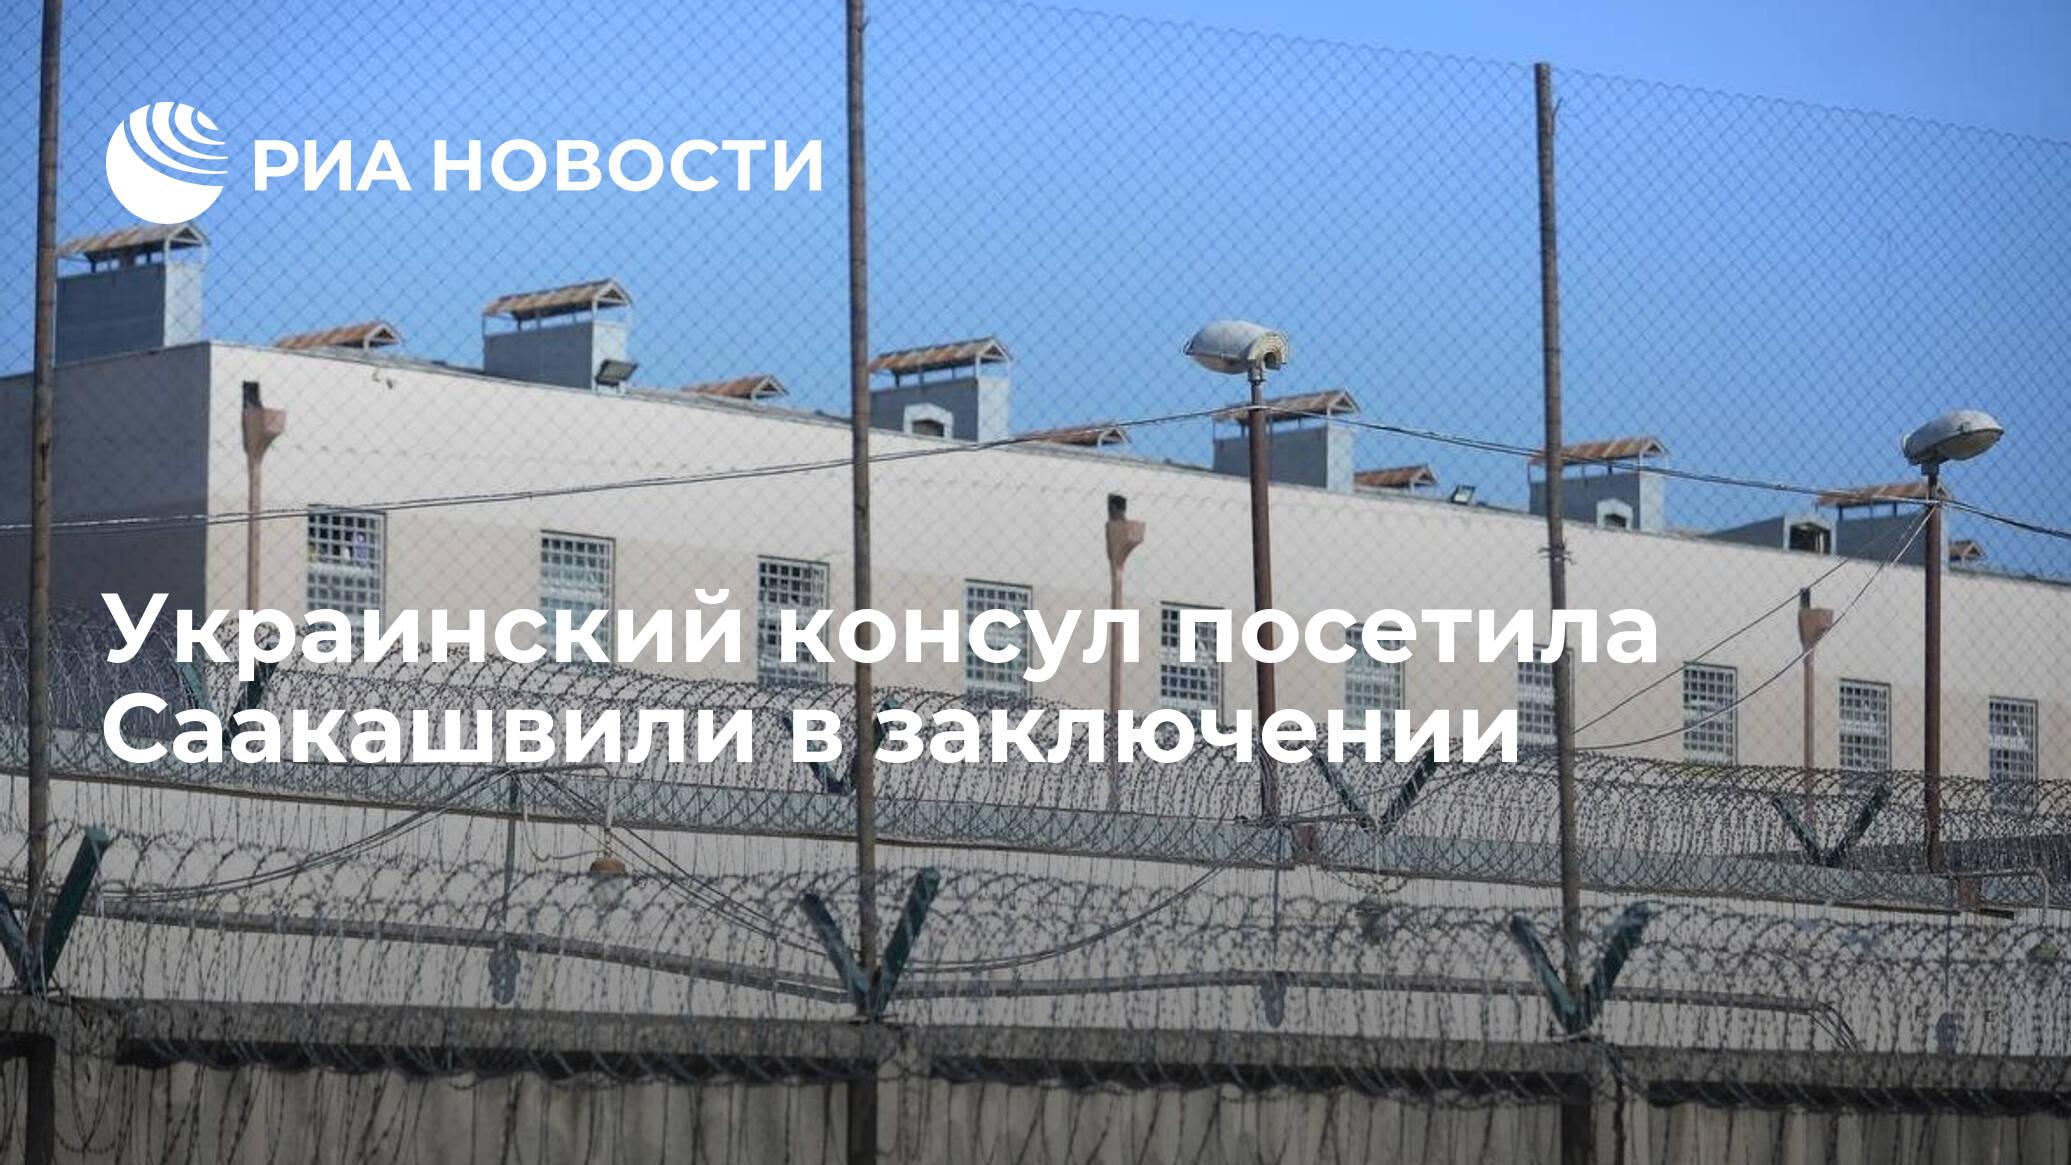 Украинский консул посетила Саакашвили в заключении